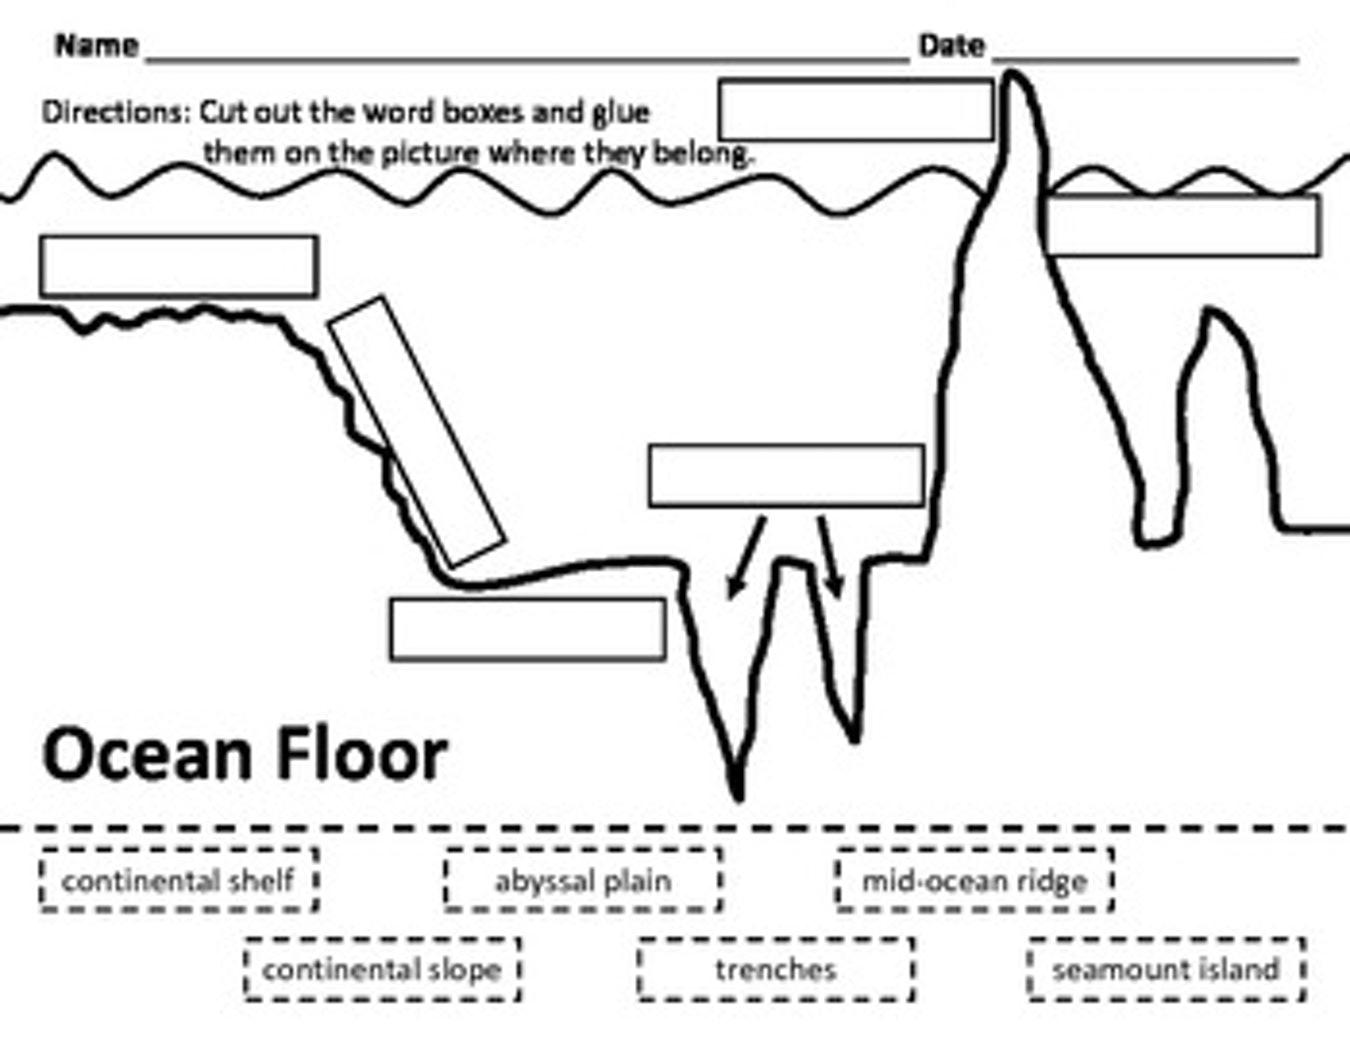 Ocean Floor Diagram Worksheet Original 330232 1 Enchanting